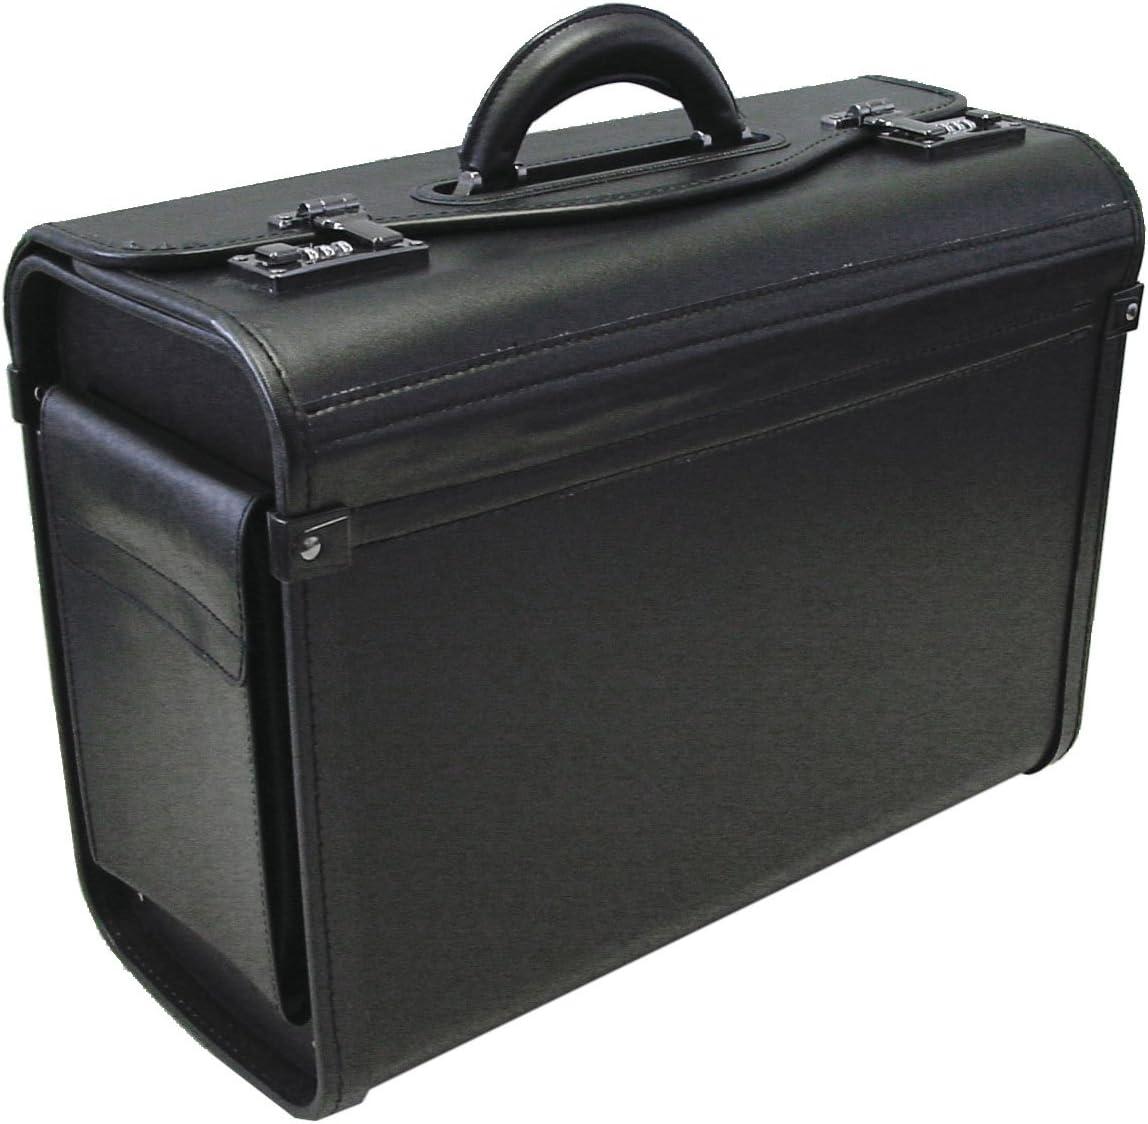 Max 74% OFF service ALASSIO Men's Pilot Case Black Size One